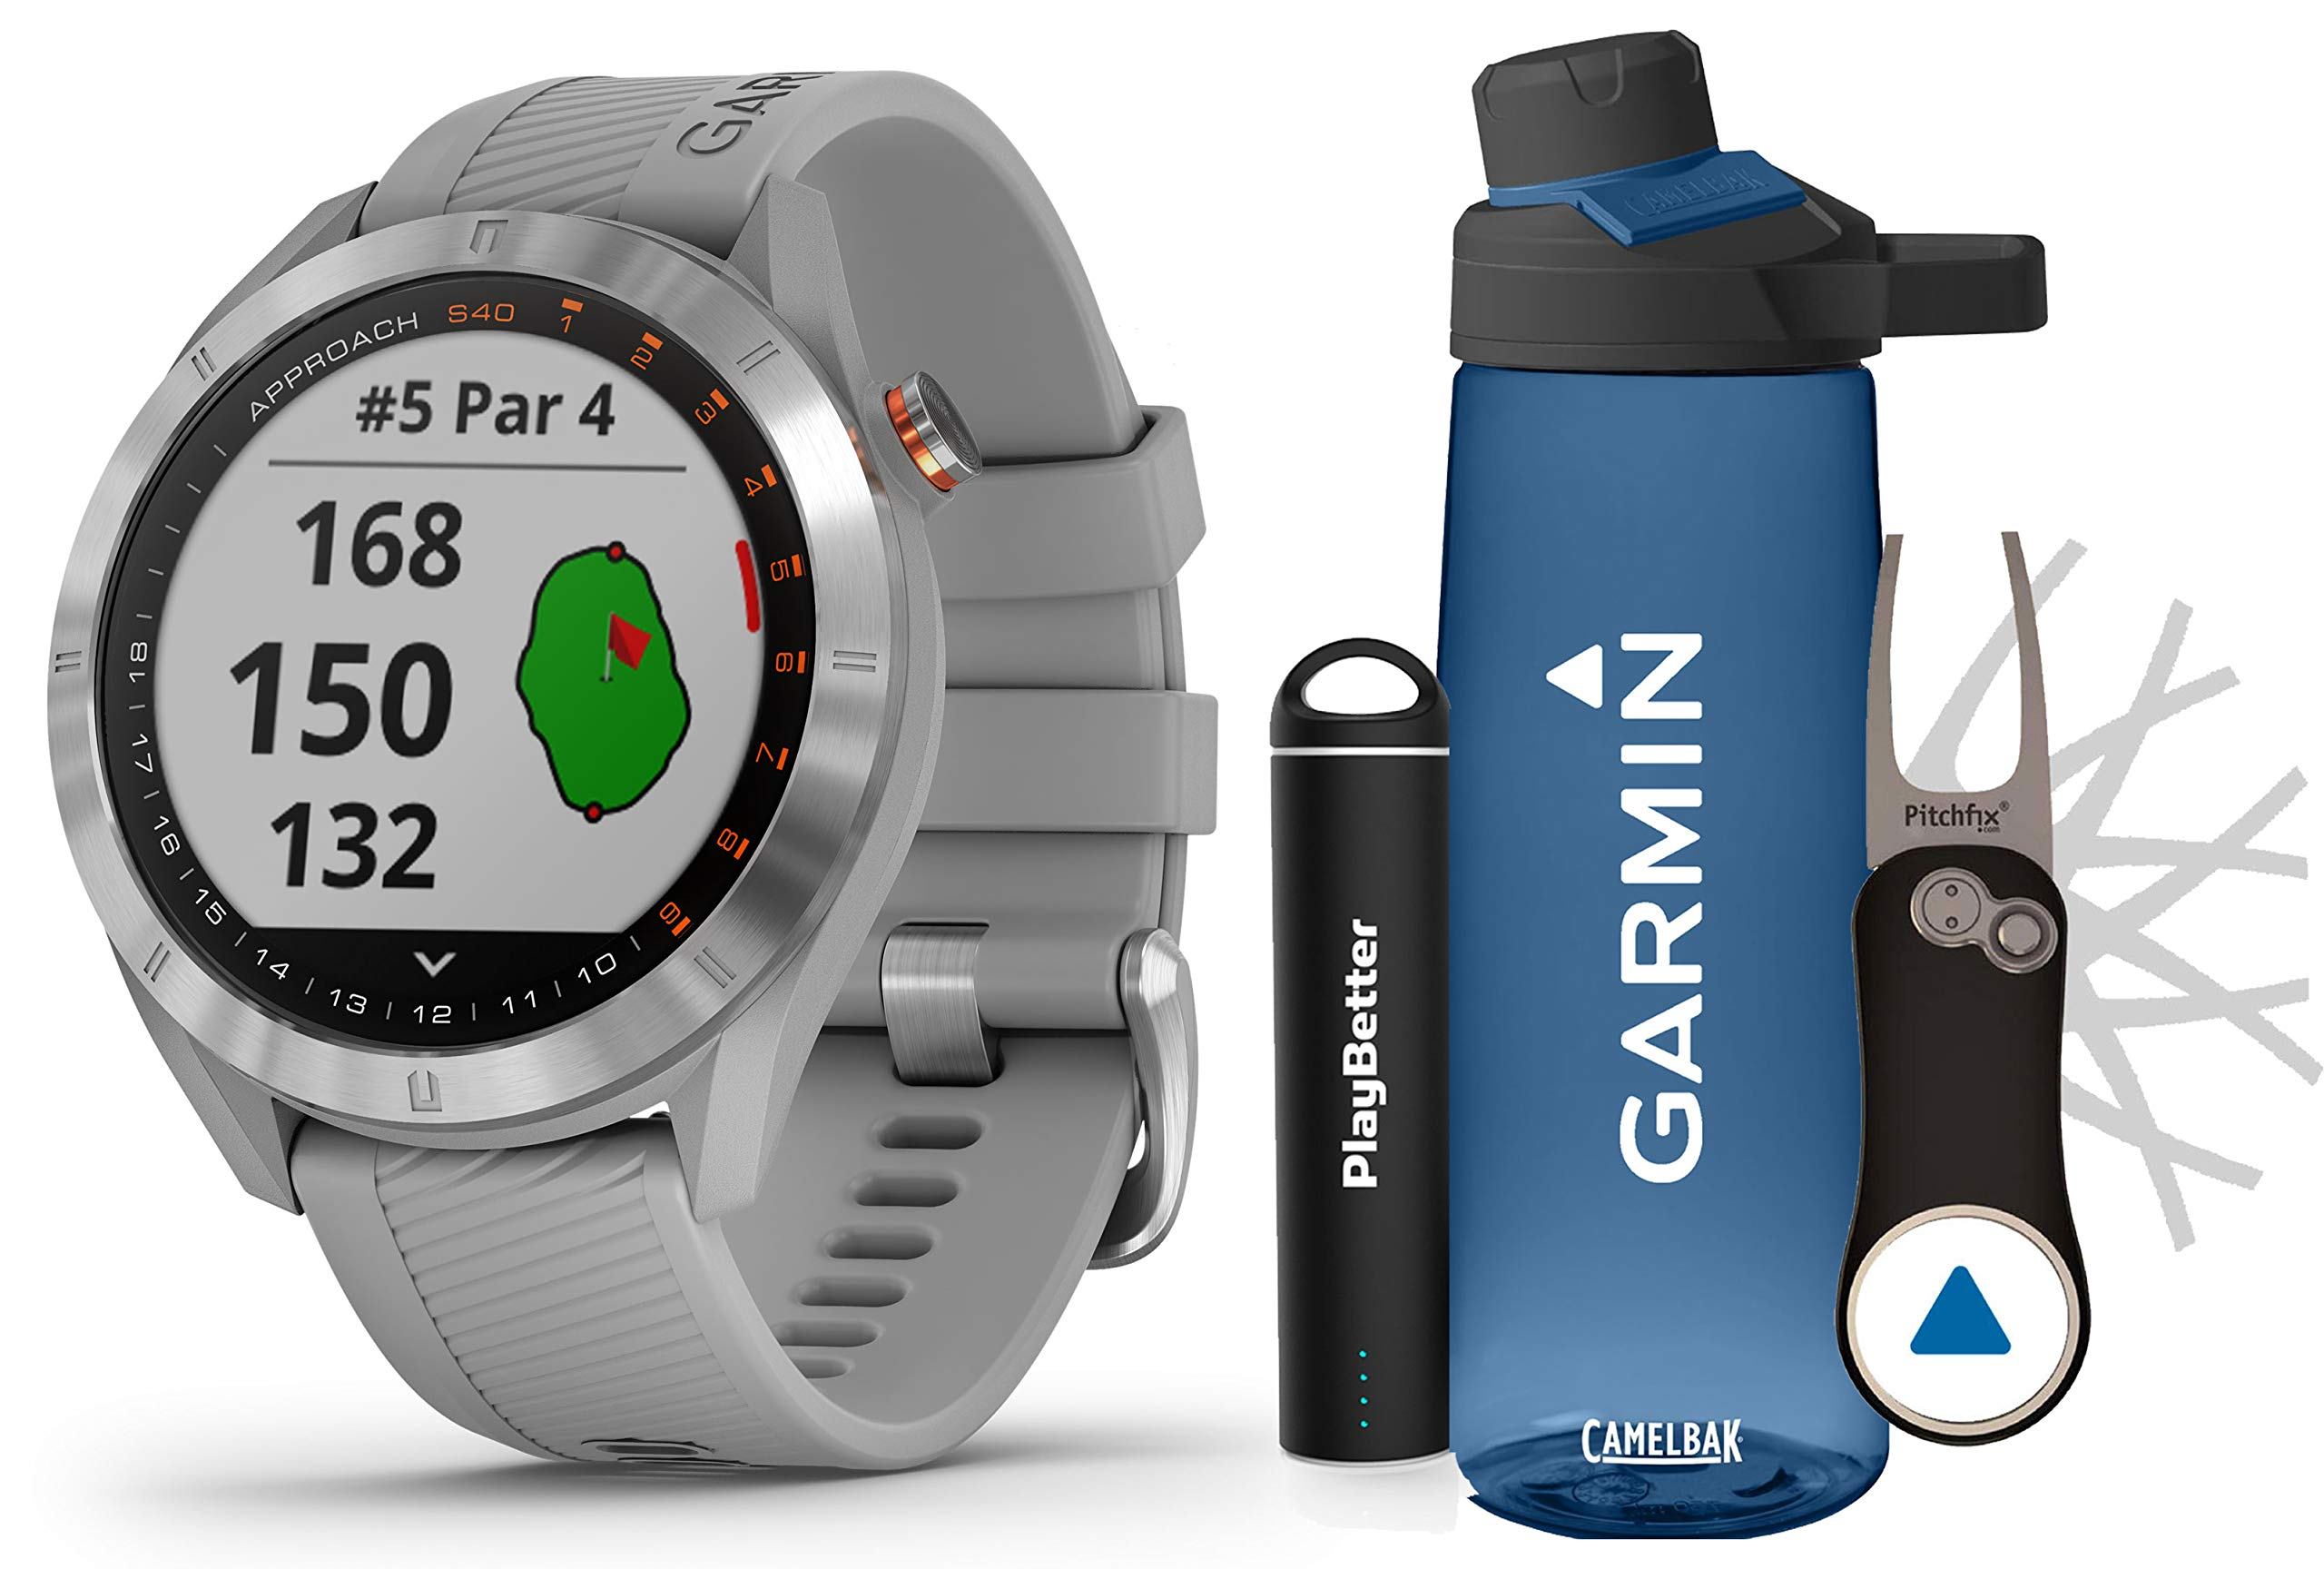 Garmin Approach S40 (Powder Gray) Golf GPS Smartwatch Premium Gift Set Bundle   +HD Screen Protectors, Garmin/PlayBetter Premium Water Bottle, Pitchfix Divot Tool & Portable Charger   41,000+ Courses